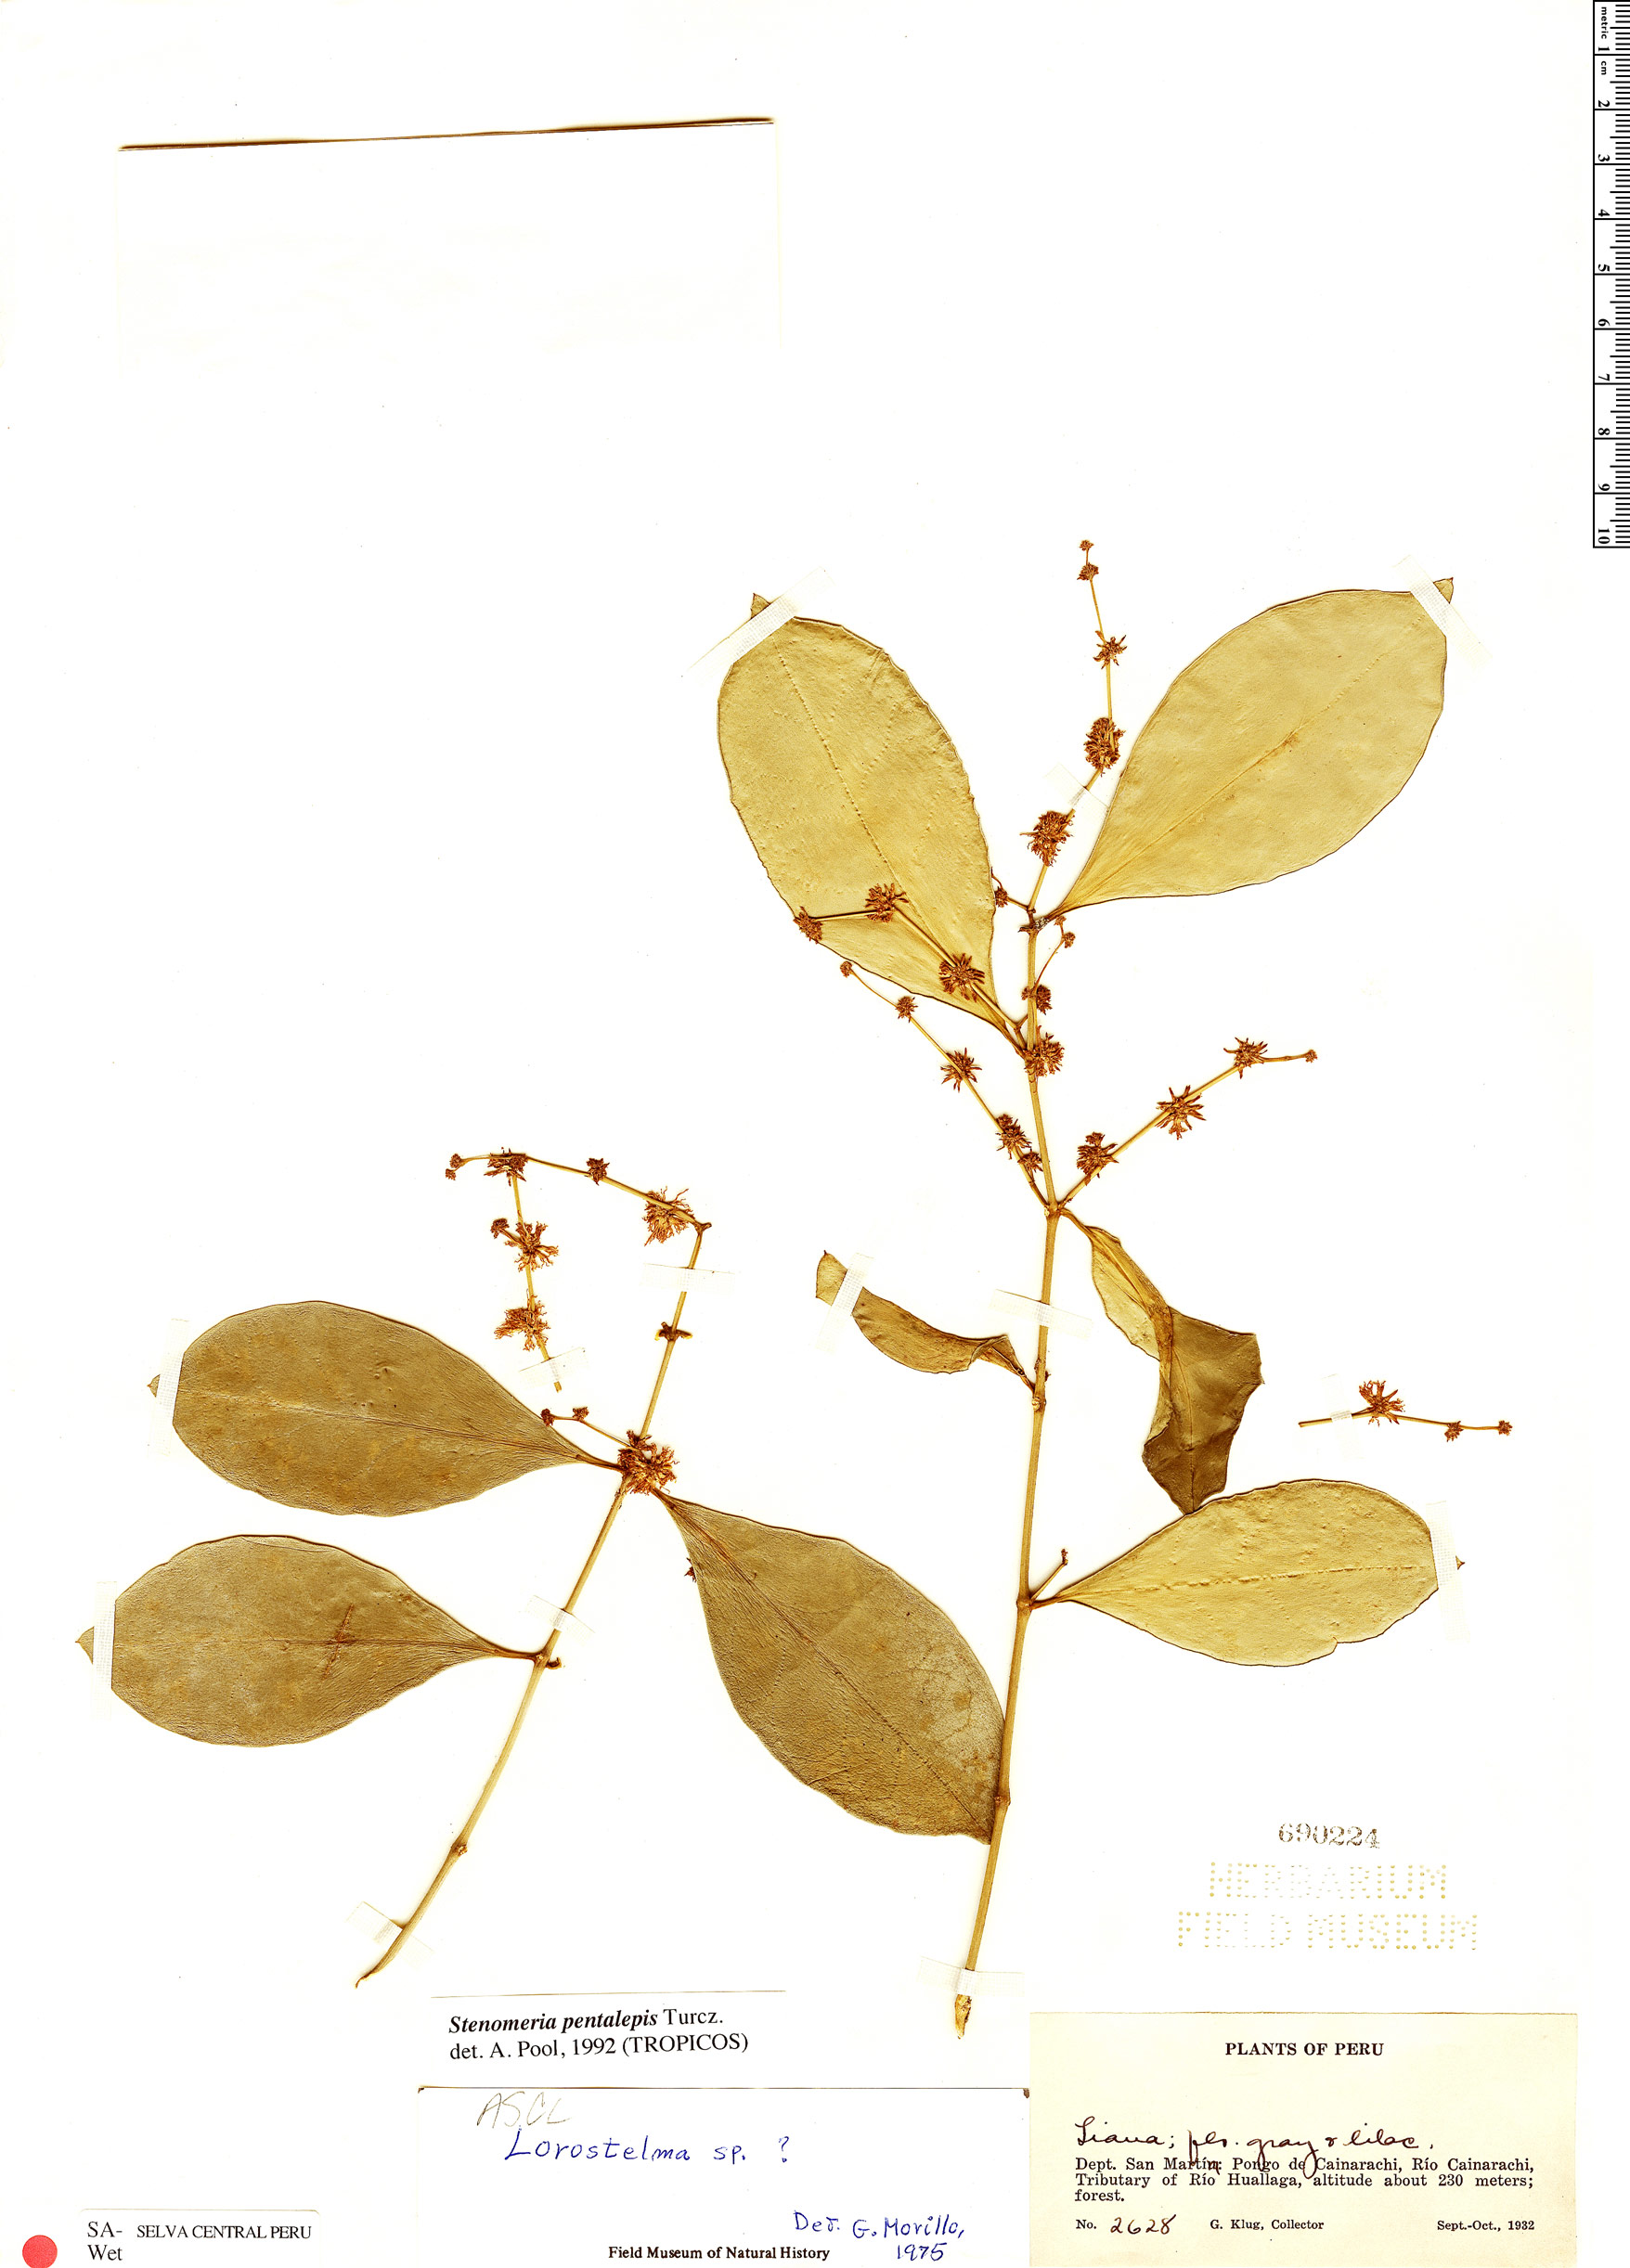 Specimen: Stenomeria pentalepis